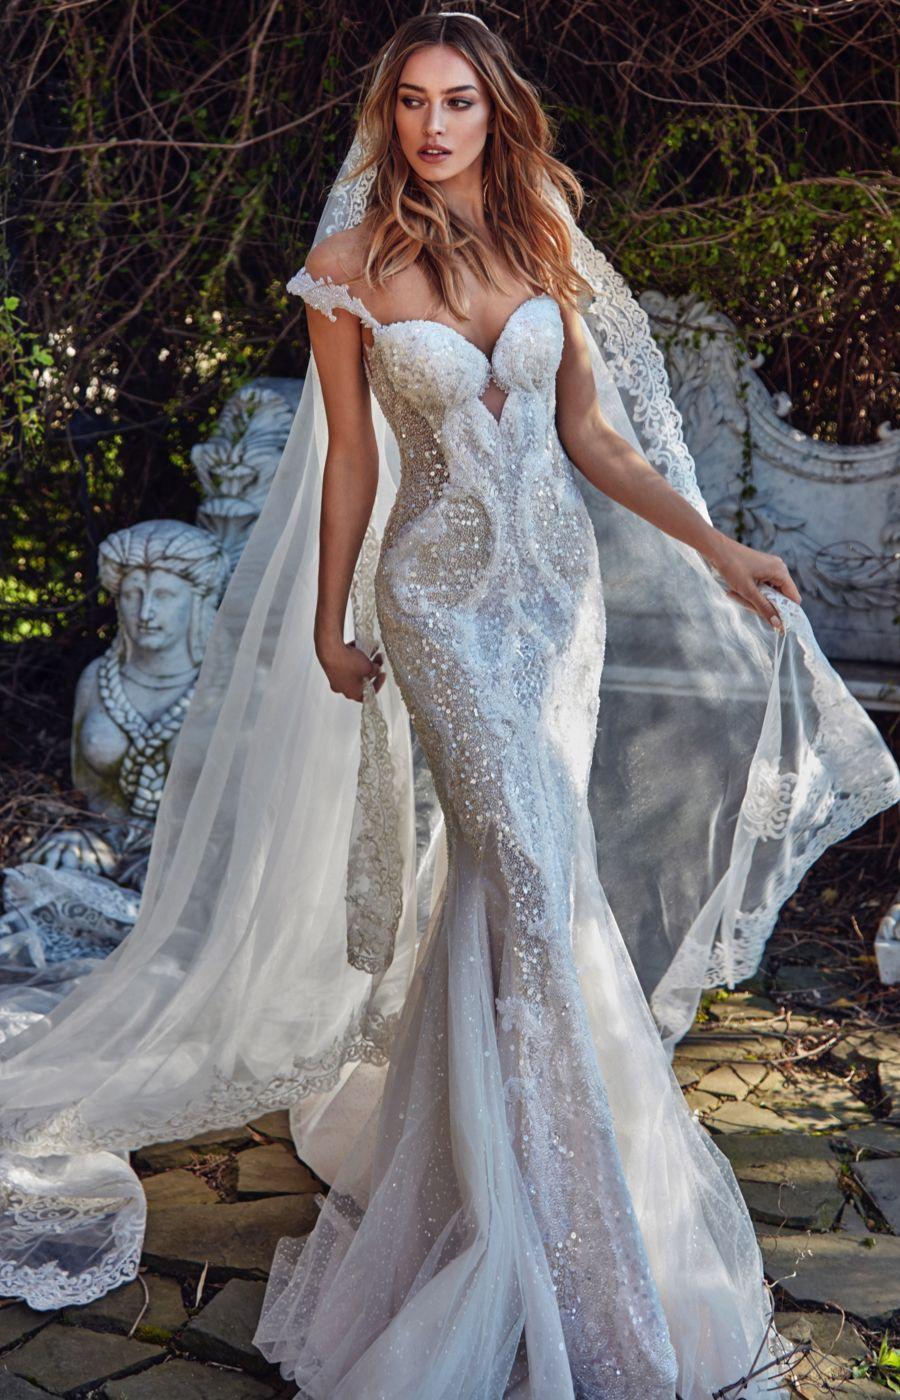 The seriously stunning 2017 Galia Lahav bridal collection | De novia ...